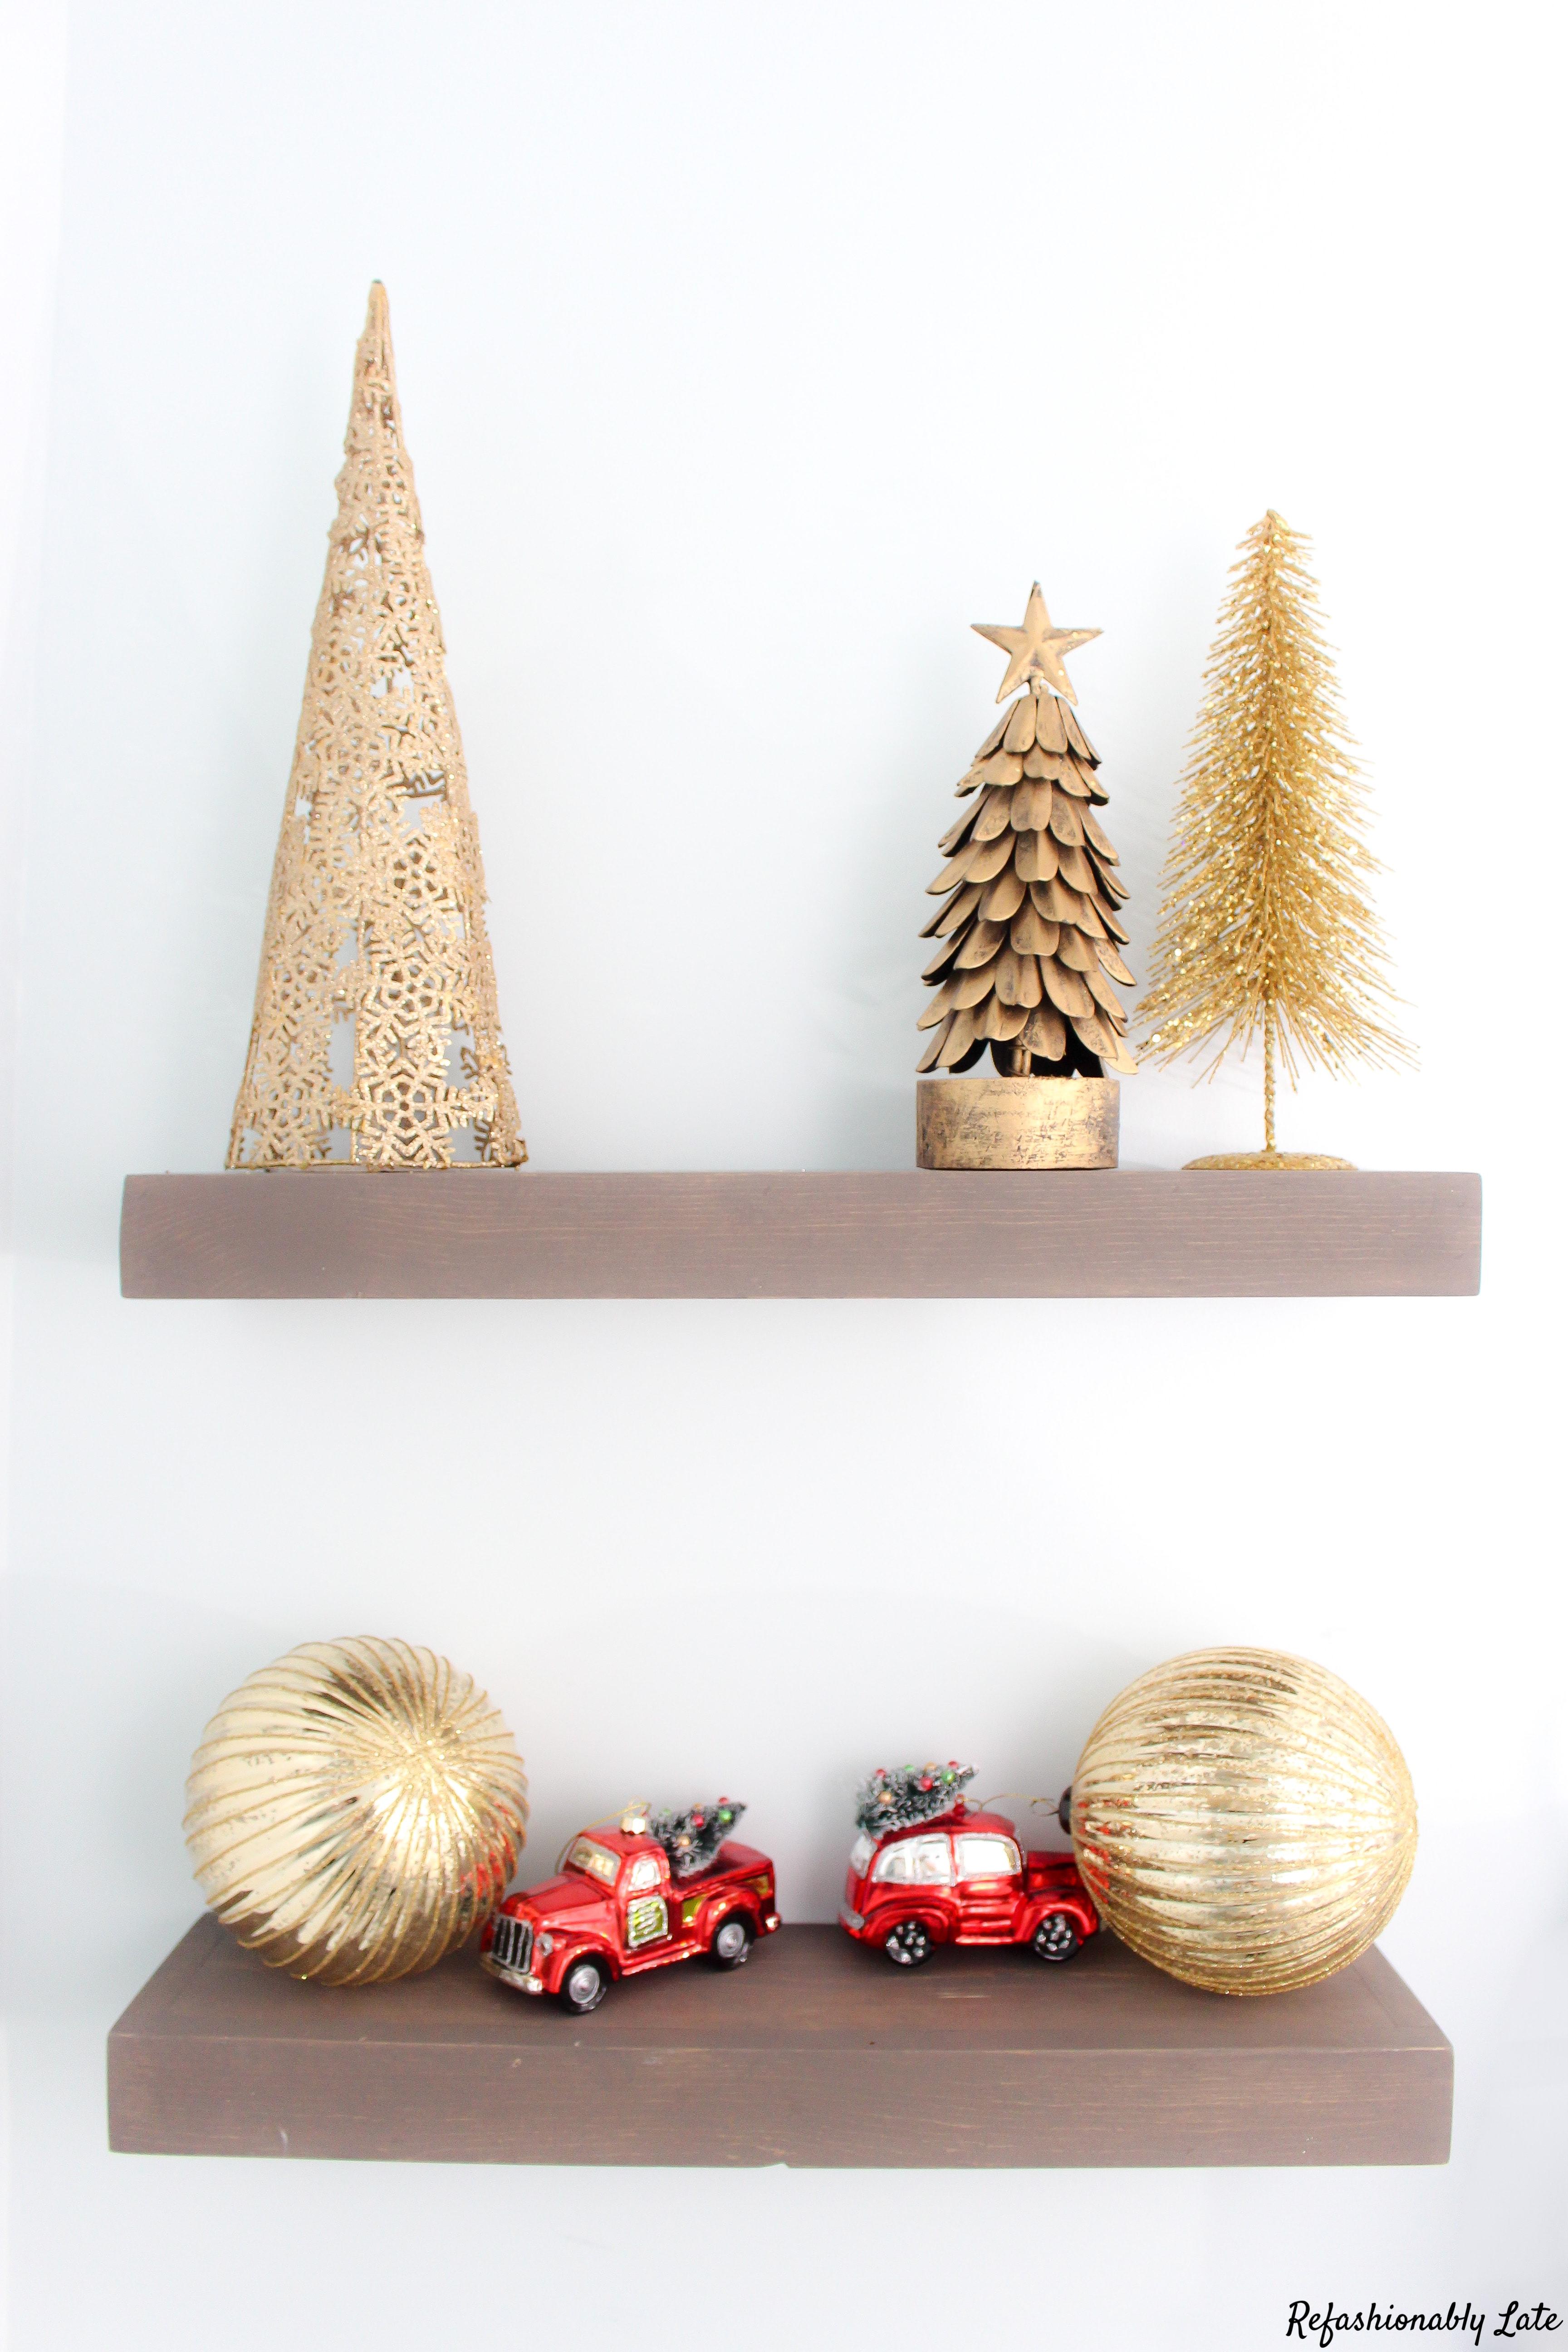 Preparing & Decorating for the Holidays - www.refashionablylate.com